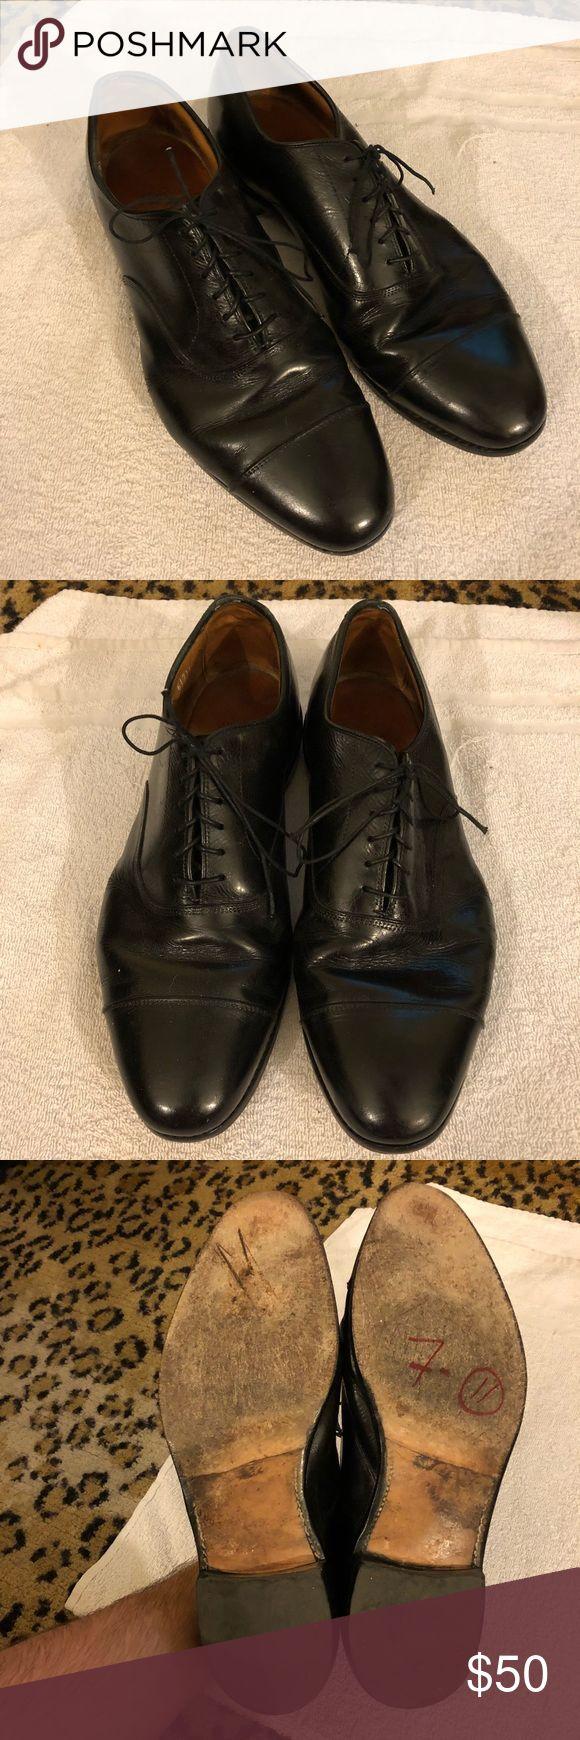 best 25+ black oxfords ideas on pinterest | brogues, oxford shoes